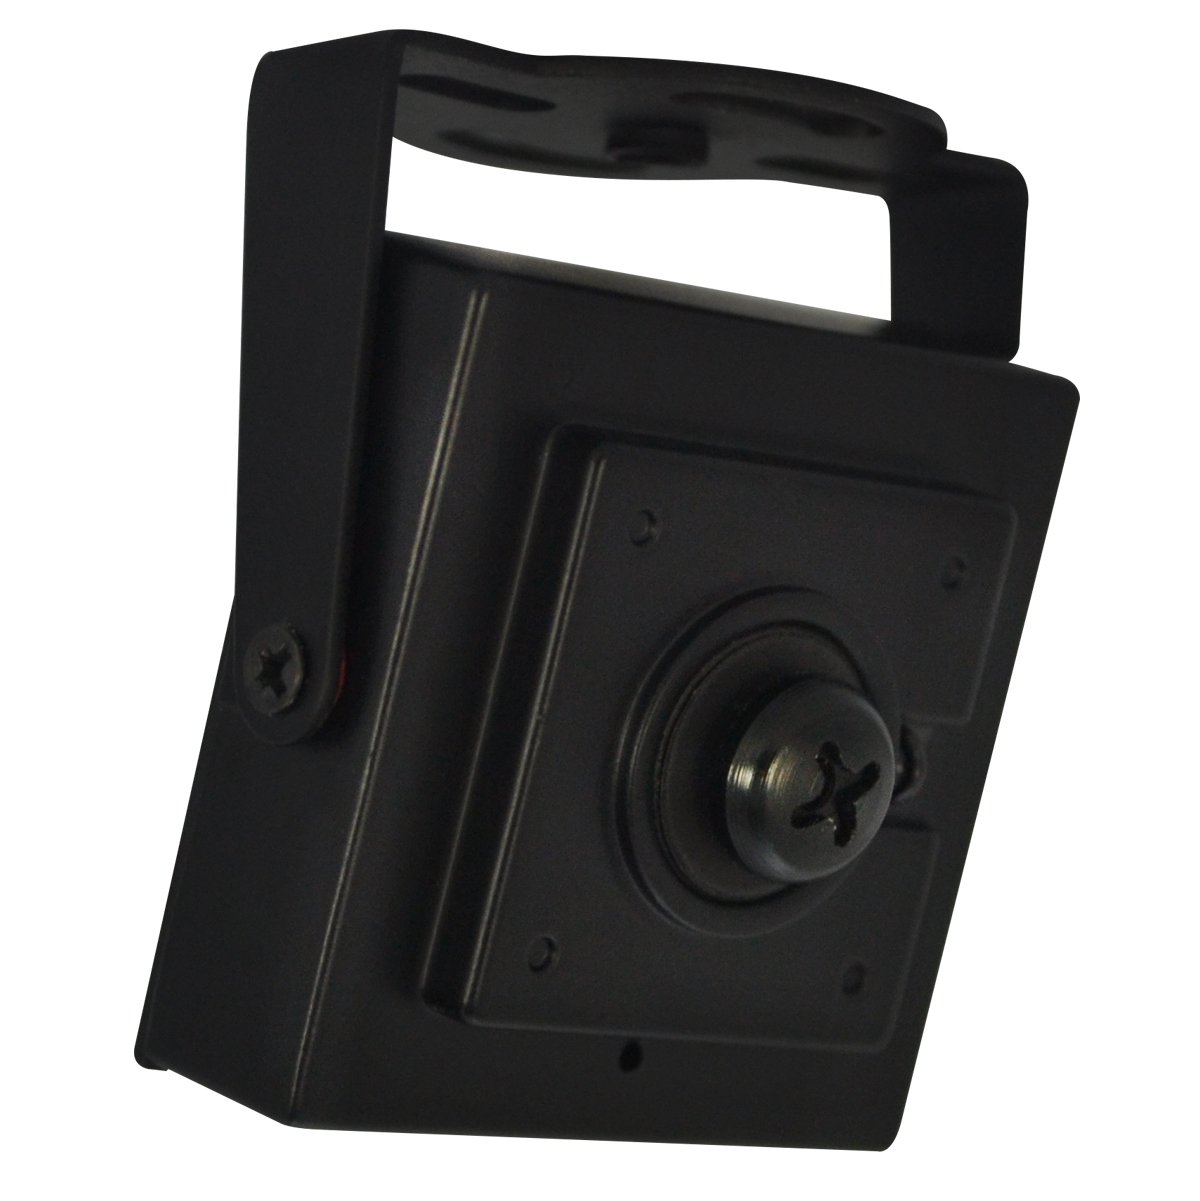 LineMak Mini Camera for indoors, 1/4'' HD Digital Sensor, 700TVL, 3.7mm Pinhole lens, for DVR or surveillance systems.